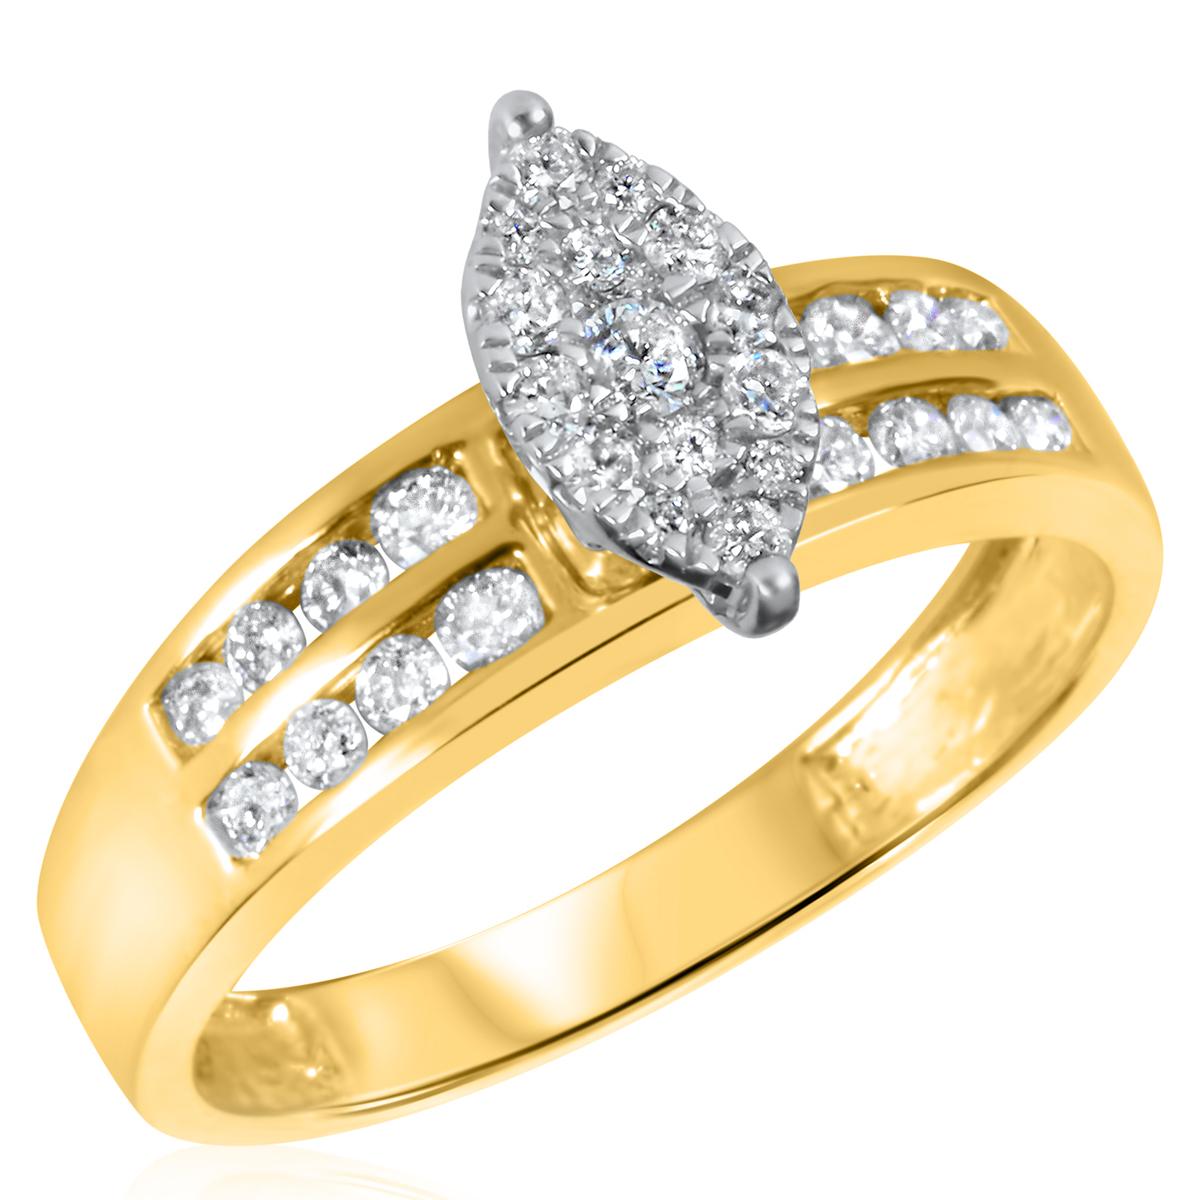 1/2 CT. T.W. Diamond Ladies Engagement Ring 10K Yellow Gold- Size 8